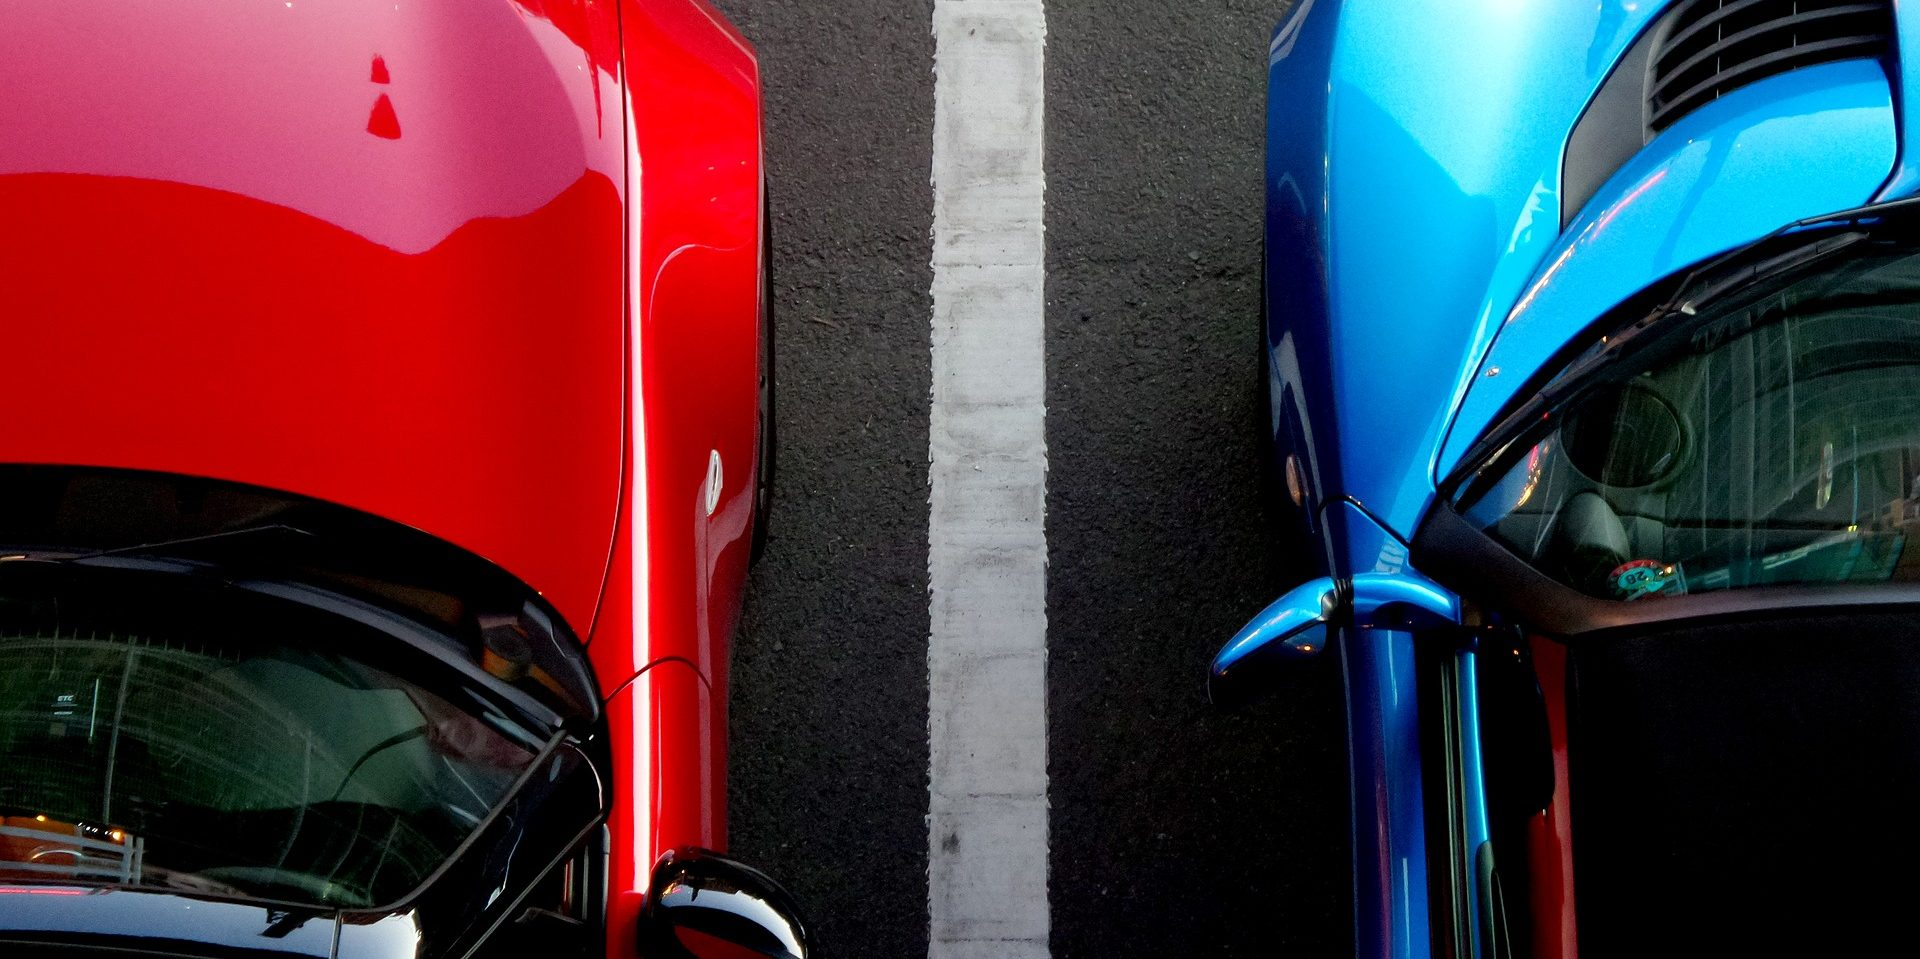 Falmouth Free Car Parking